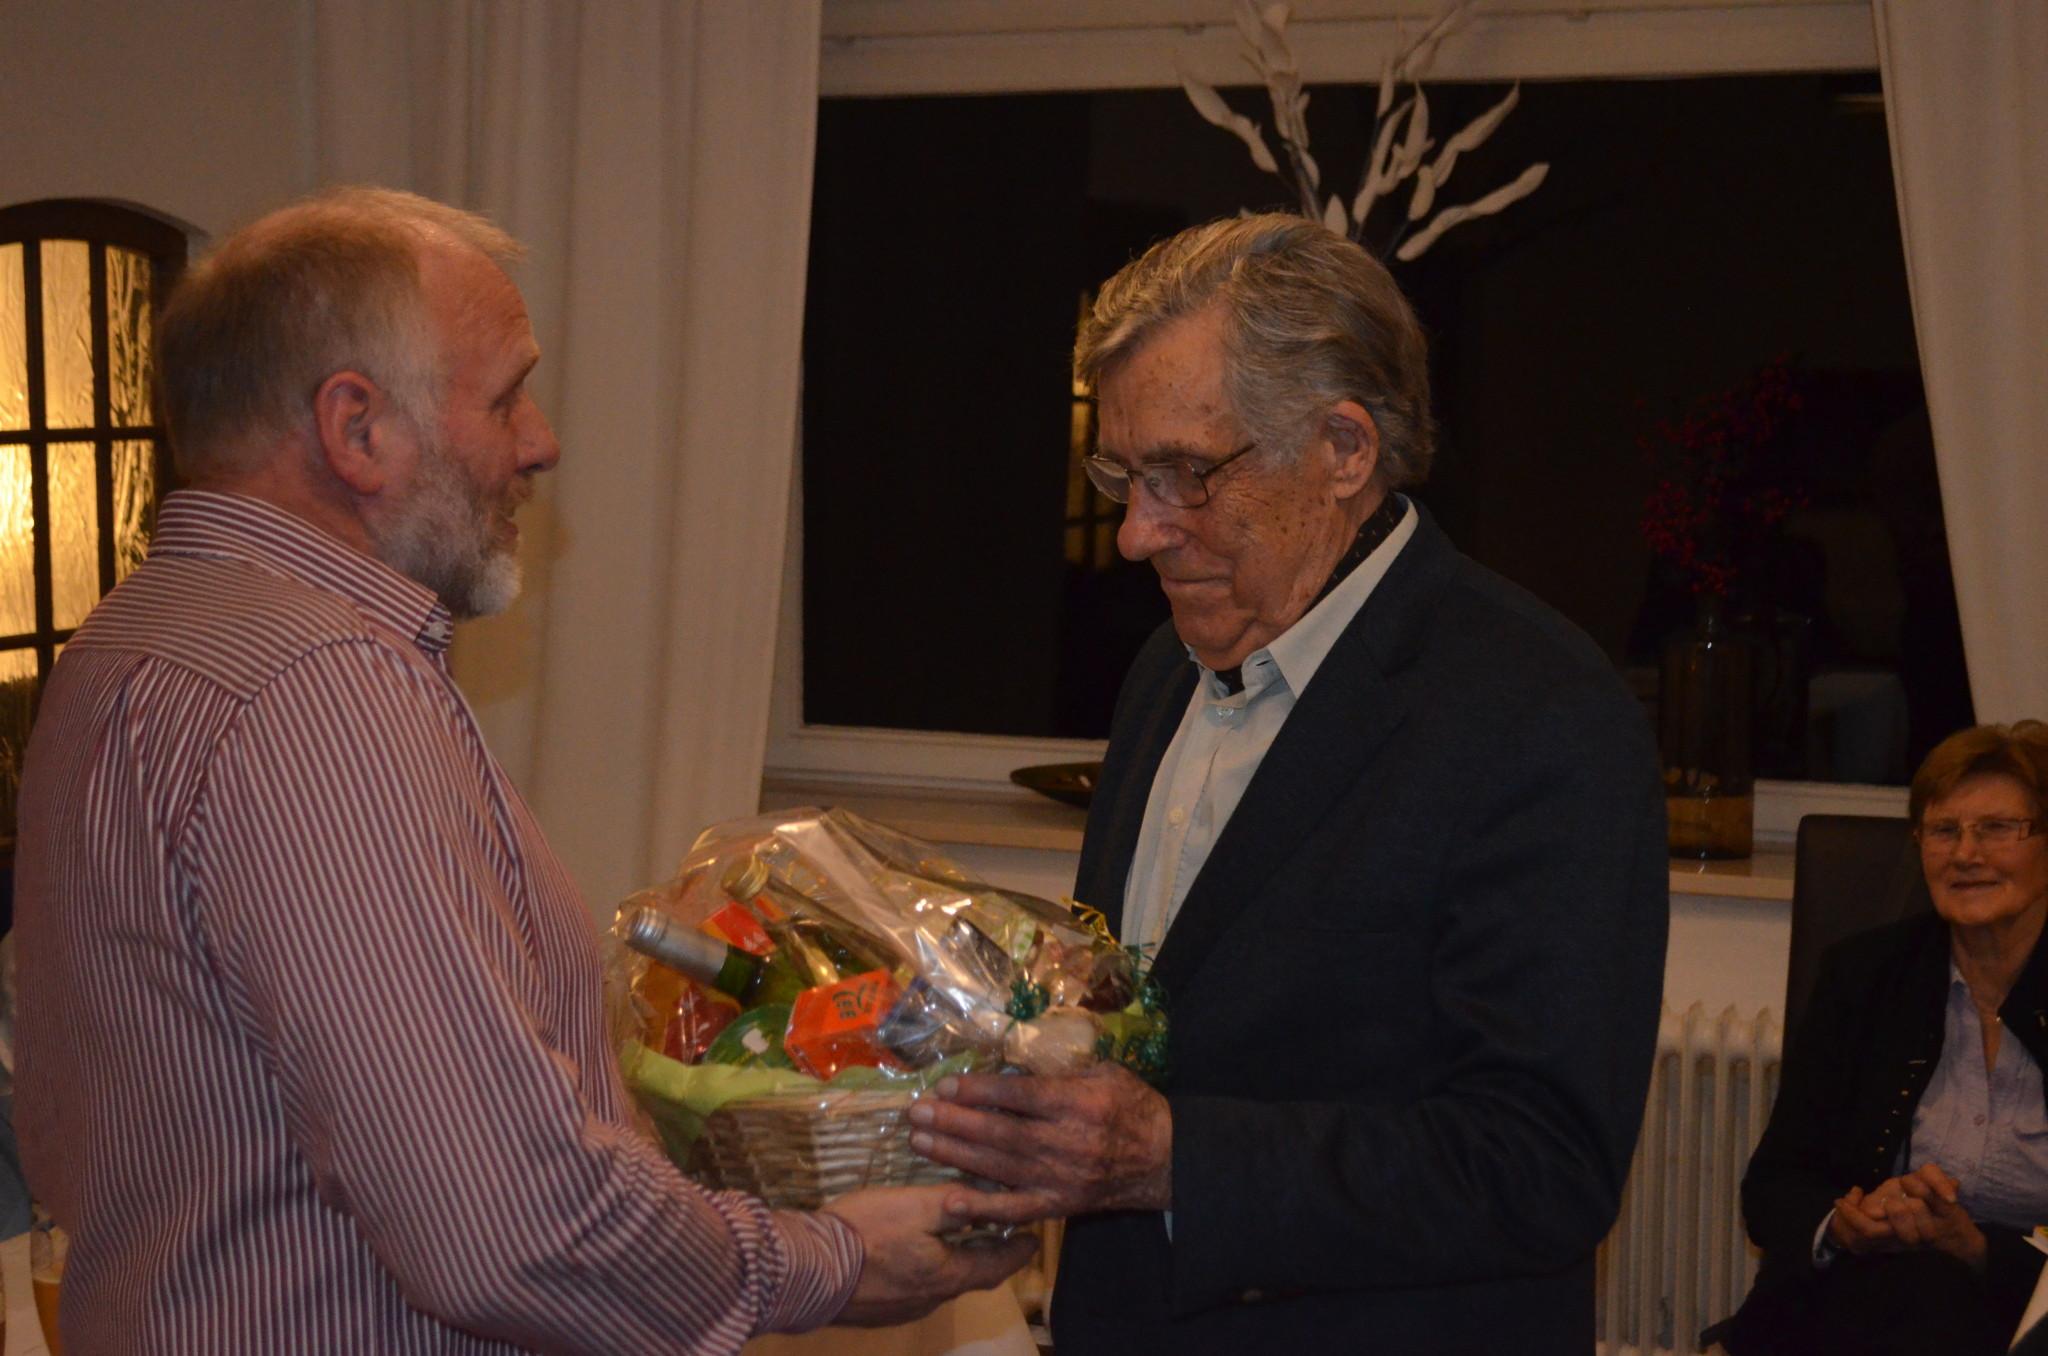 Tv Dötlingen ehrungen jahreshauptversammlung 2016 tv dötlingen